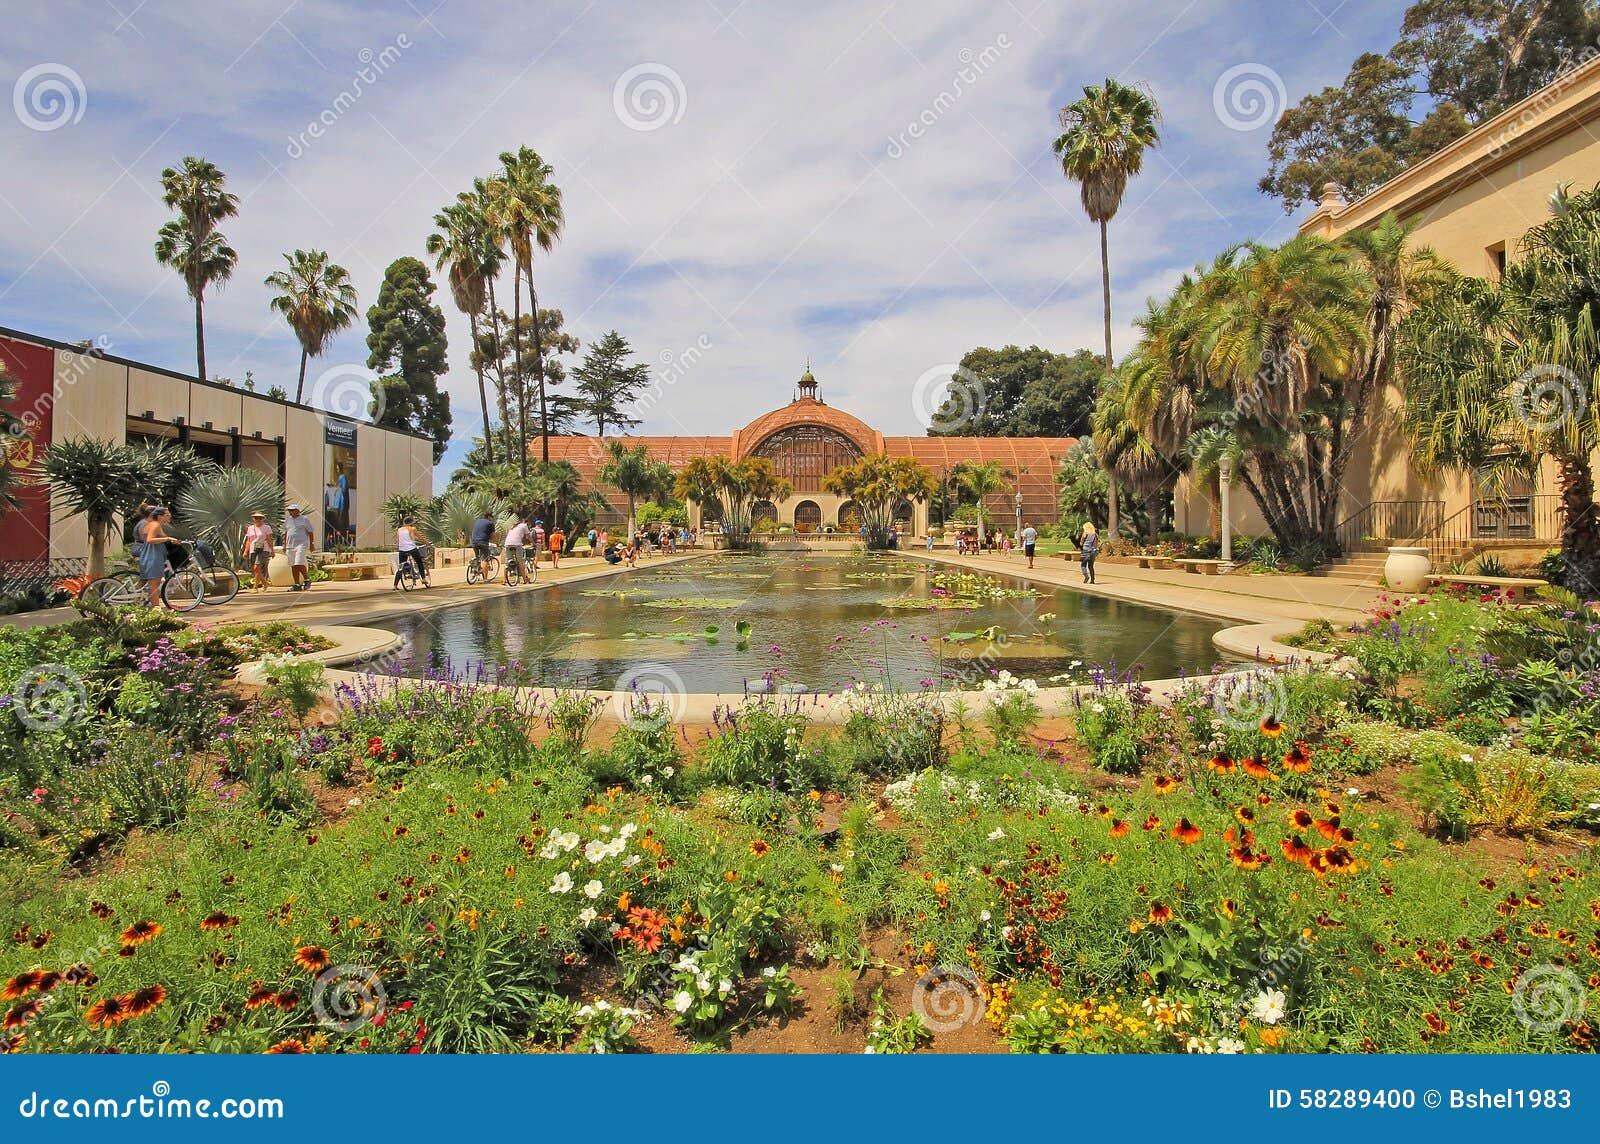 Botanical Gardens Balboa Park San Diego Editorial Image Image 58289400